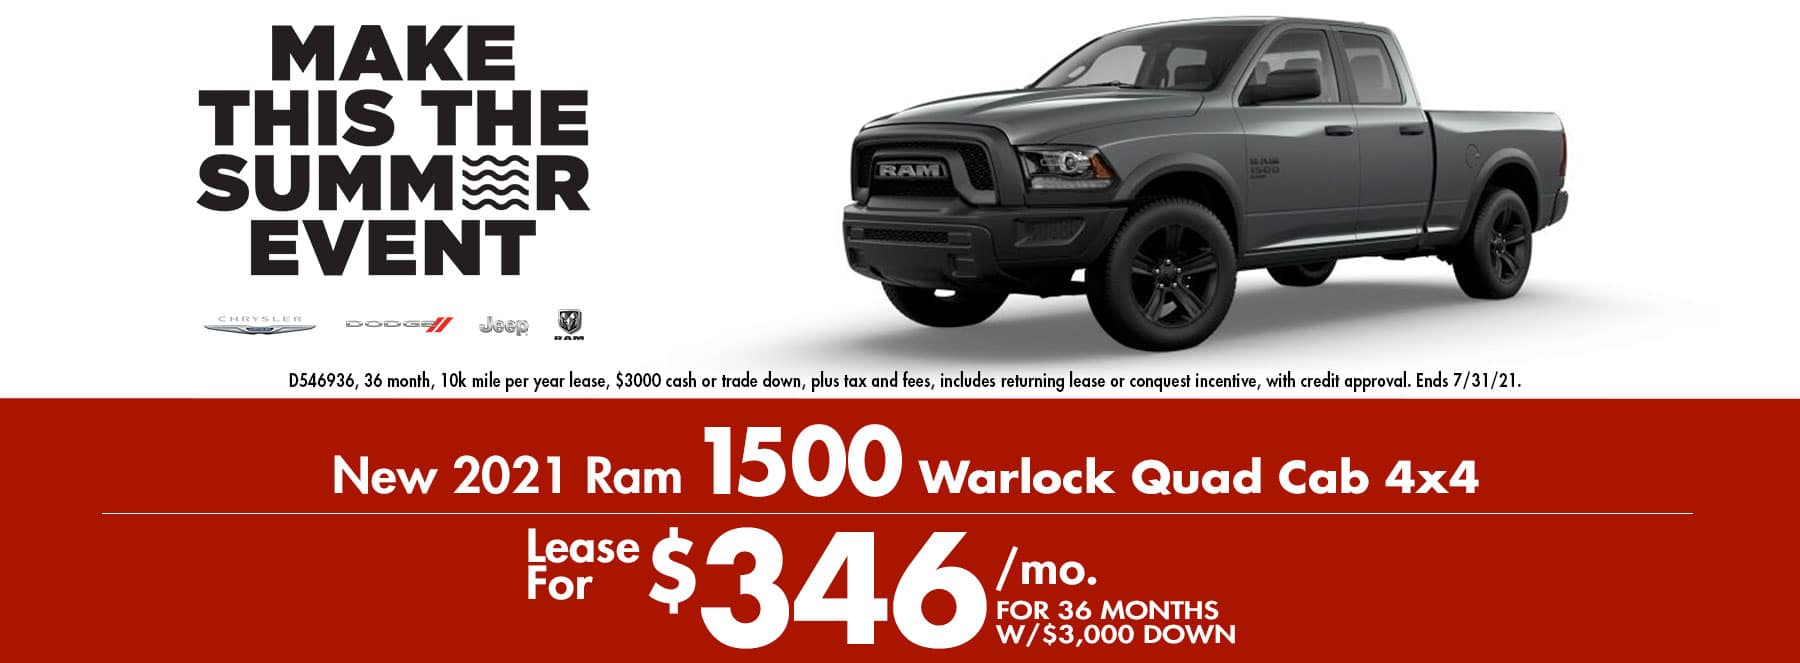 2021 Ram 1500 Warlock